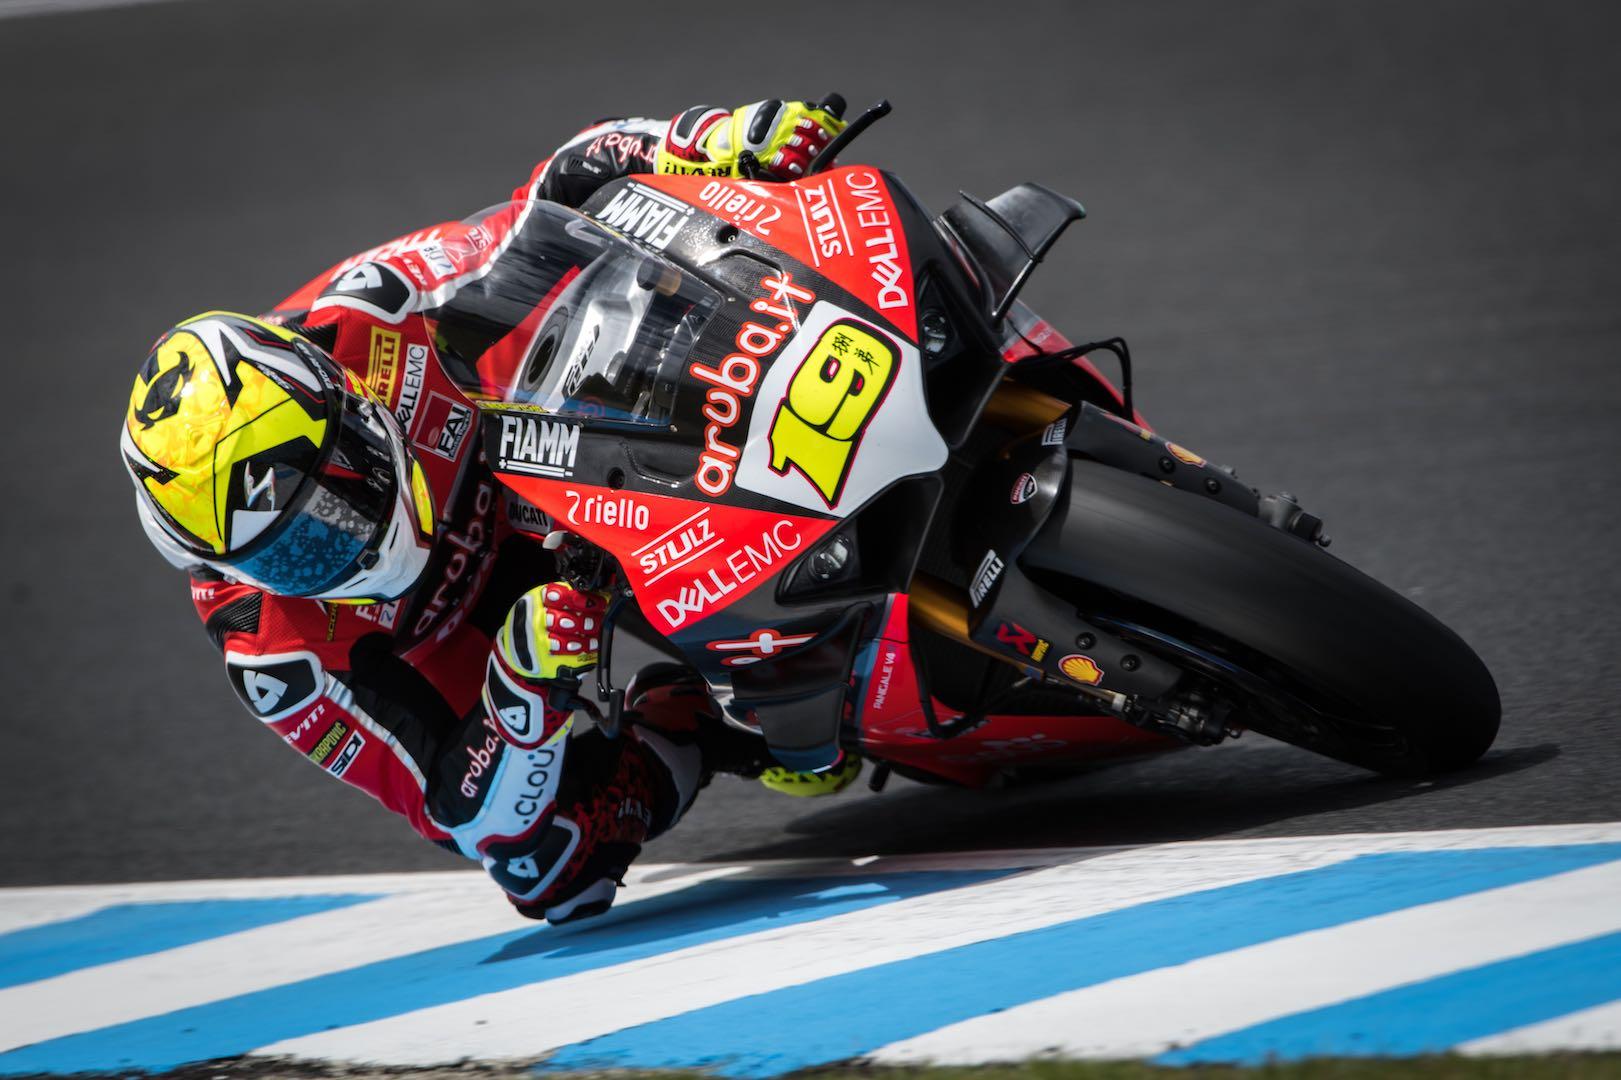 Ducati's Bautista Tops 2019 Australia World Superbike Test